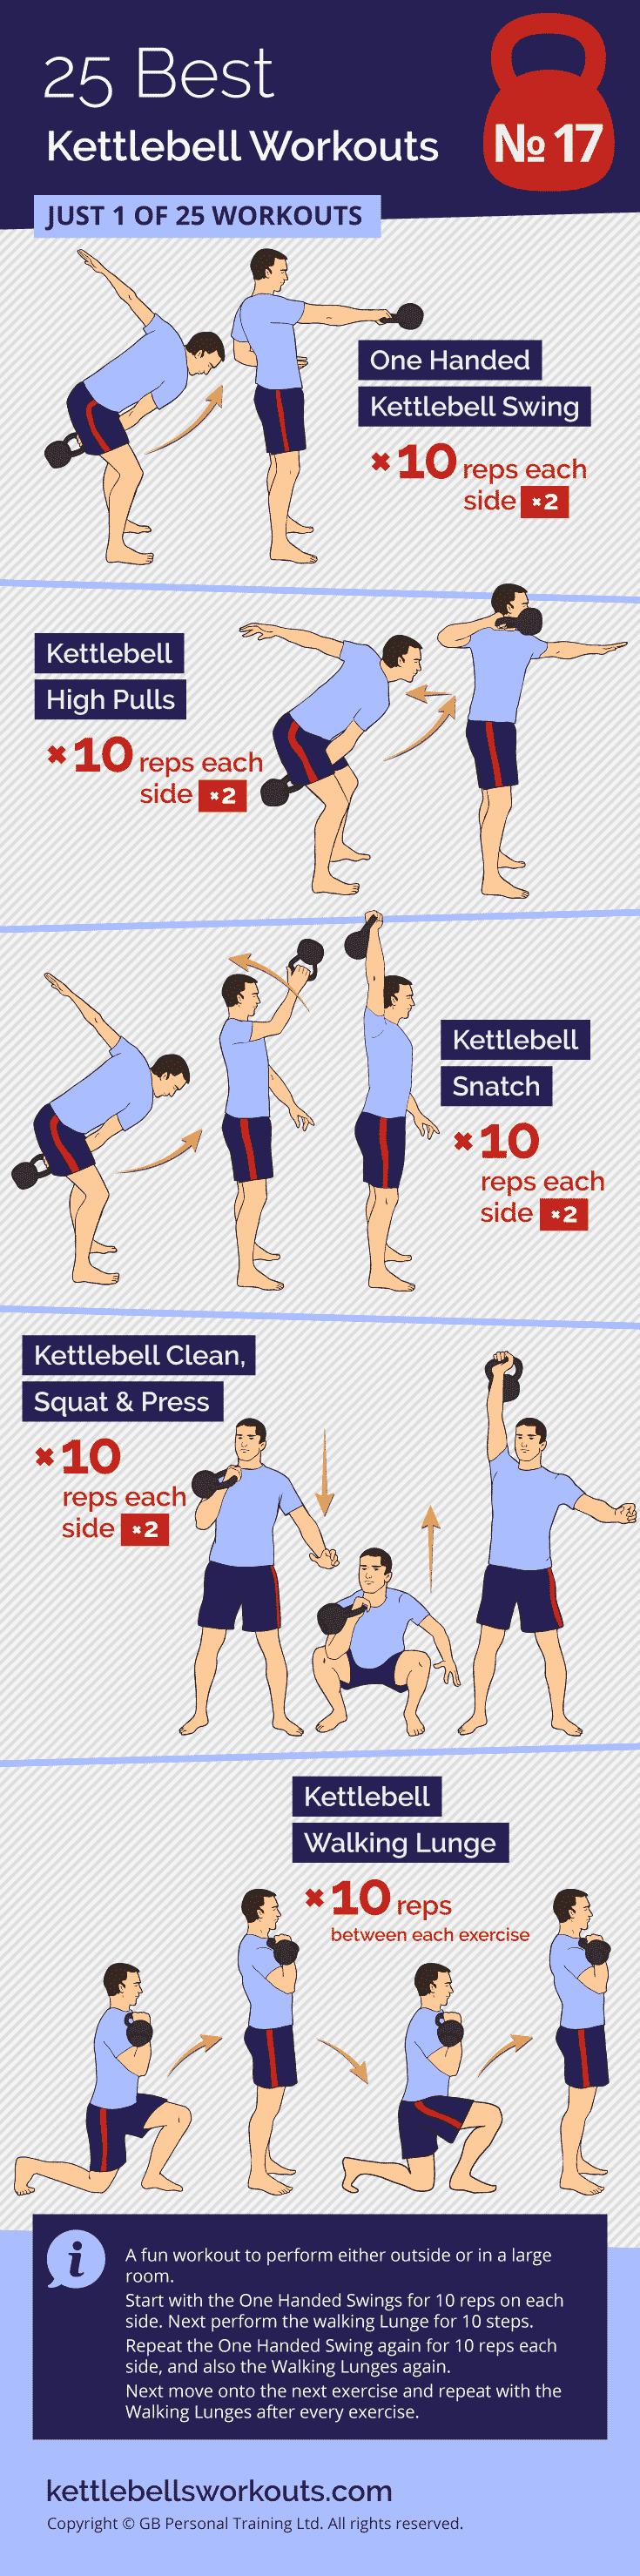 10 and Walk Kettlebell Workout